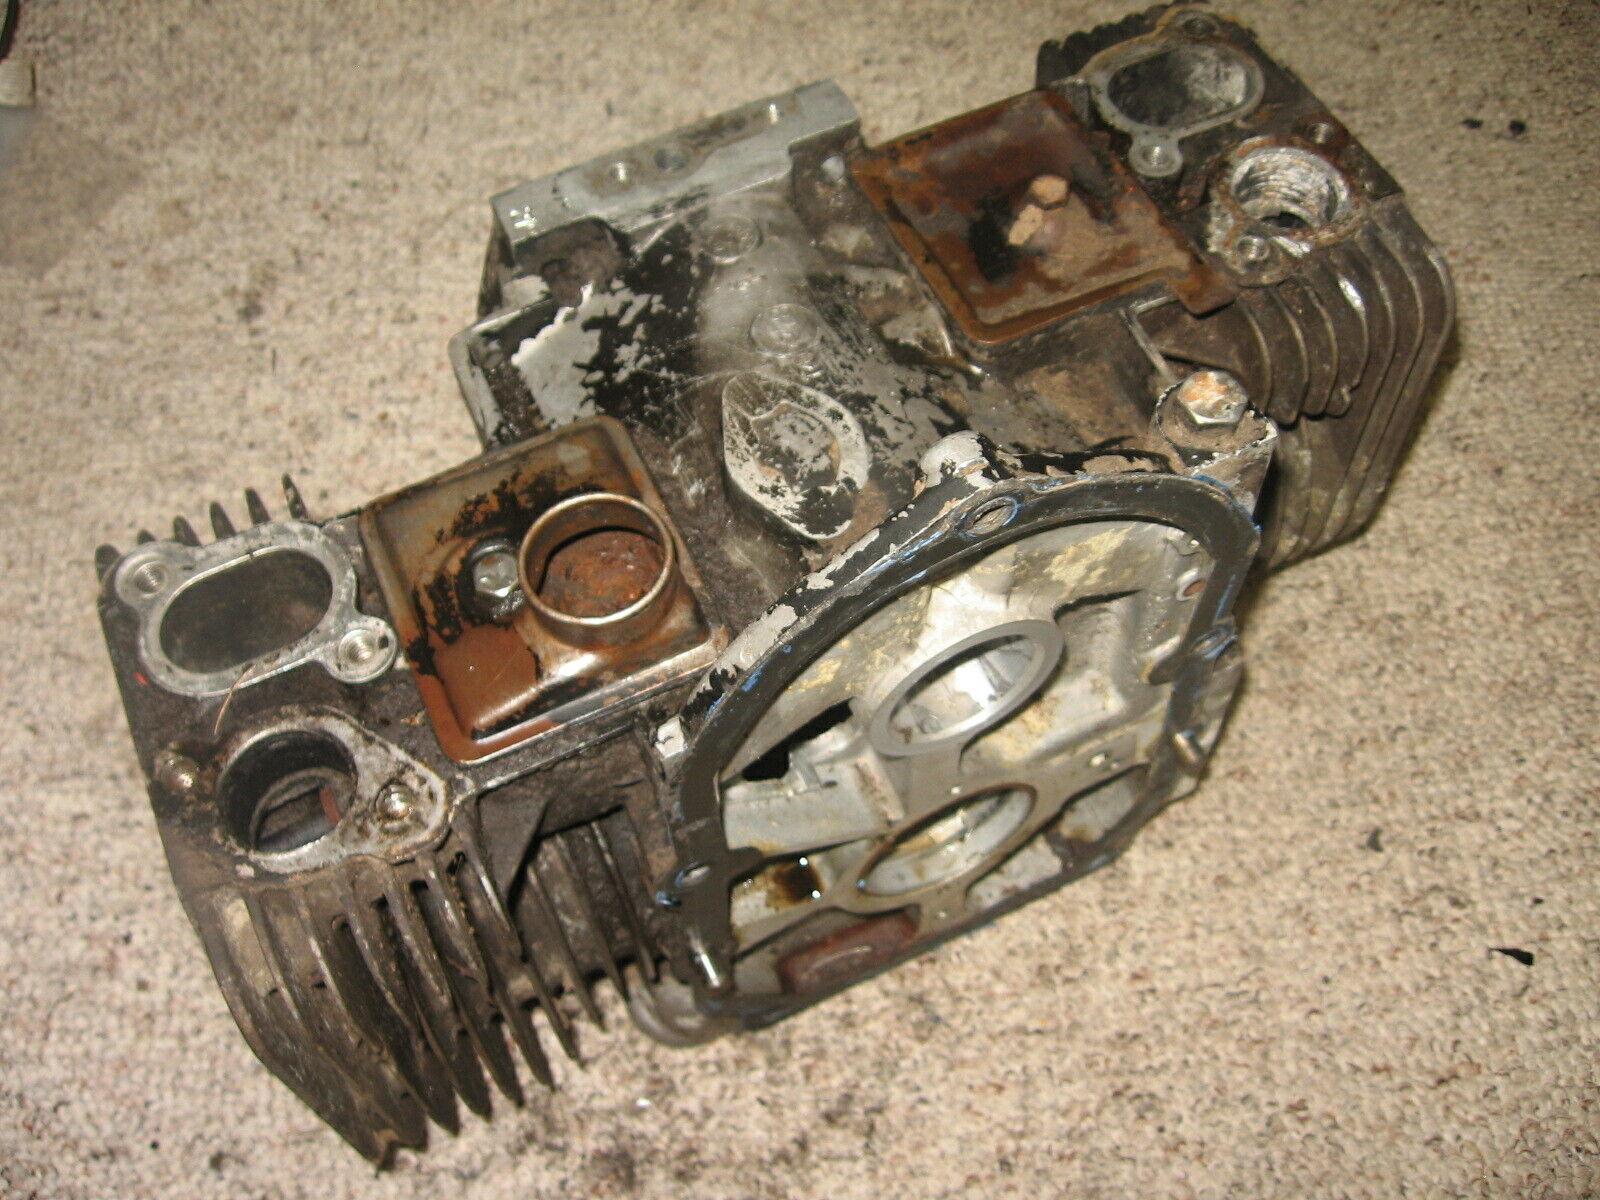 Onan Case Ingersoll del bloque del motor-Modelo B43M-GA016 16hp